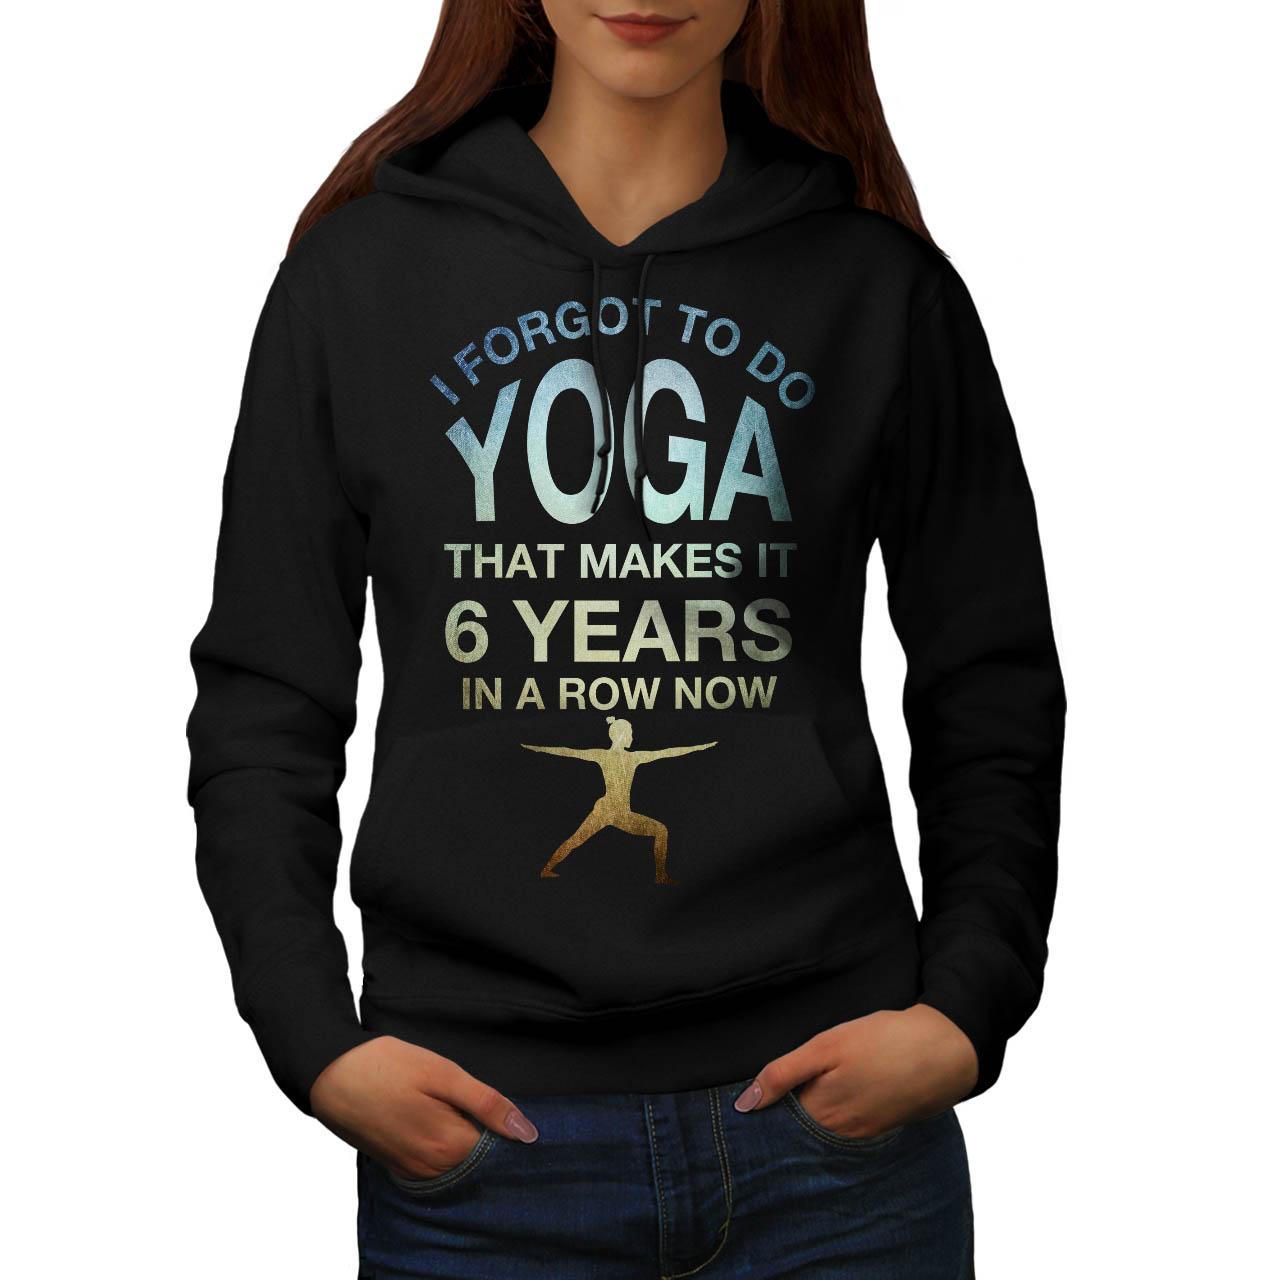 Lazy Funny Casual Hooded Sweatshirt Wellcoda Yoga Excercise Womens Hoodie